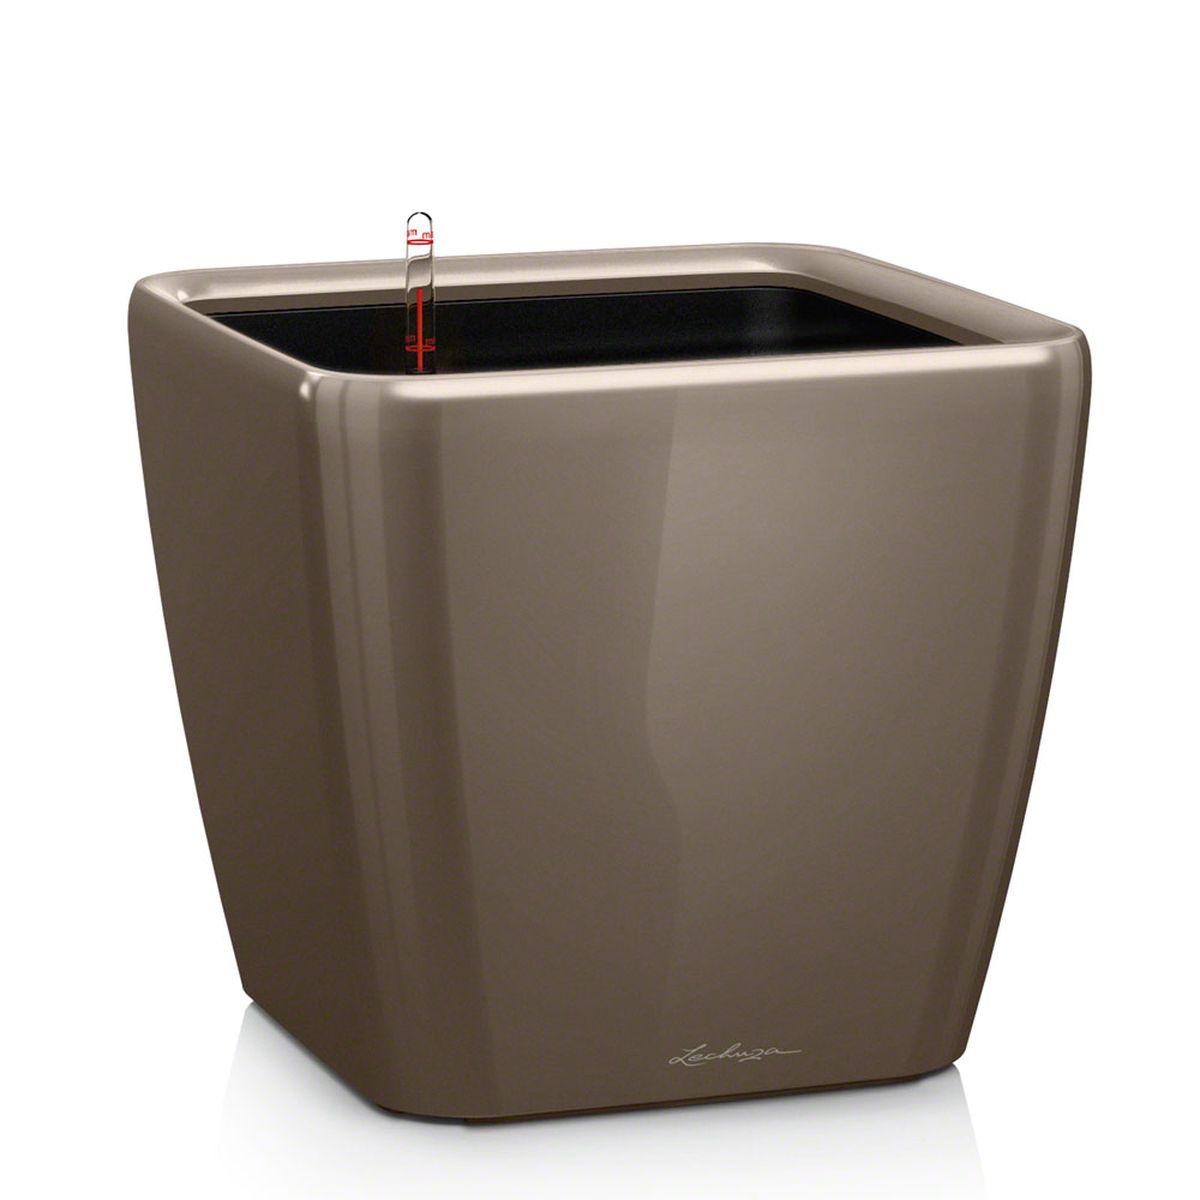 "Кашпо Lechuza ""Quadro"", с системой автополива, цвет: серо-коричневый, 21 х 21 х 20 см"